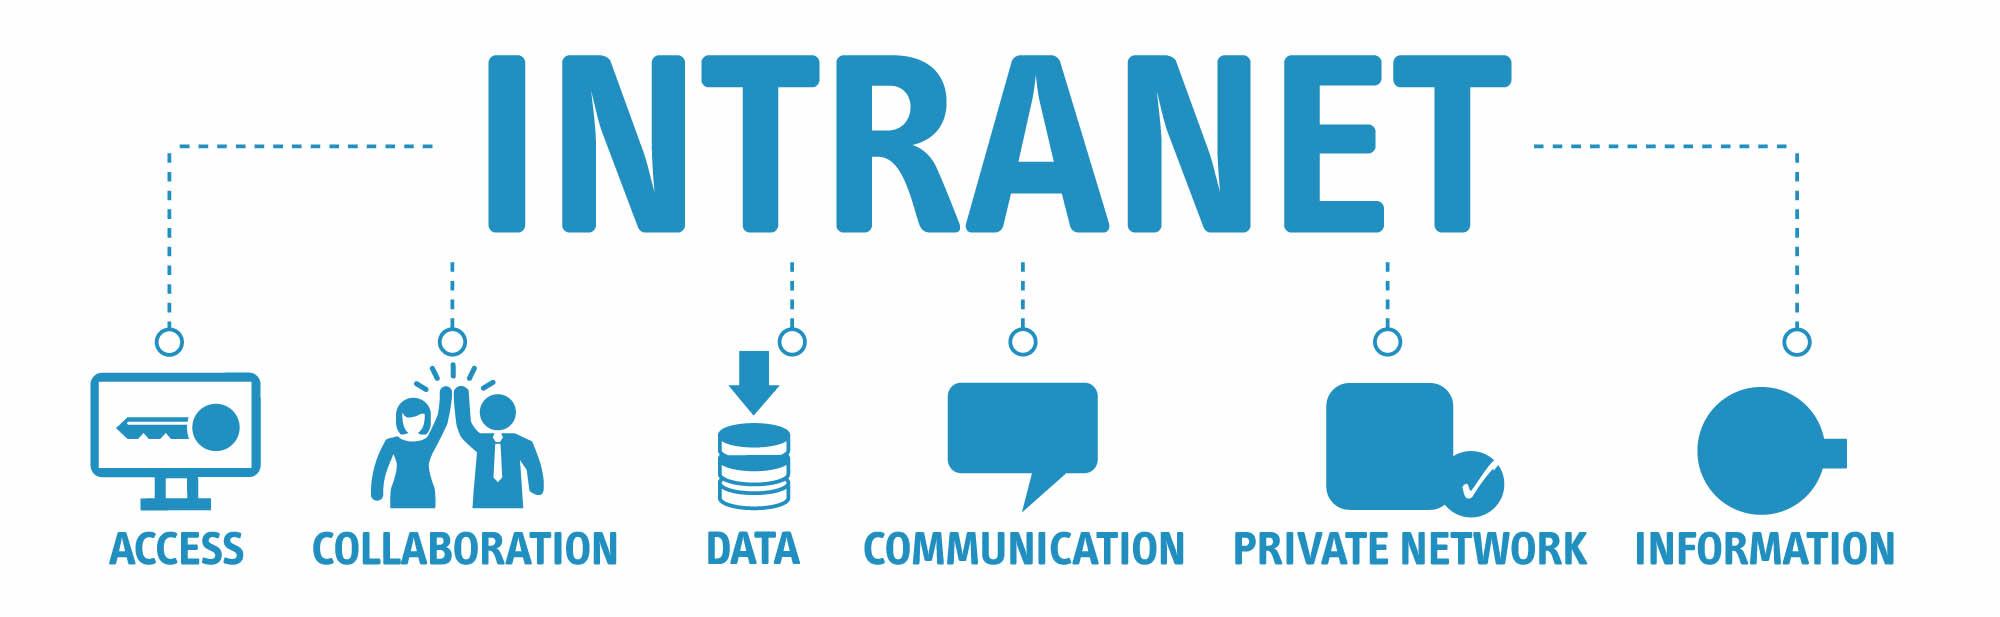 DIGITAL TRANSFORMATION FOR COMPANY INTRANET